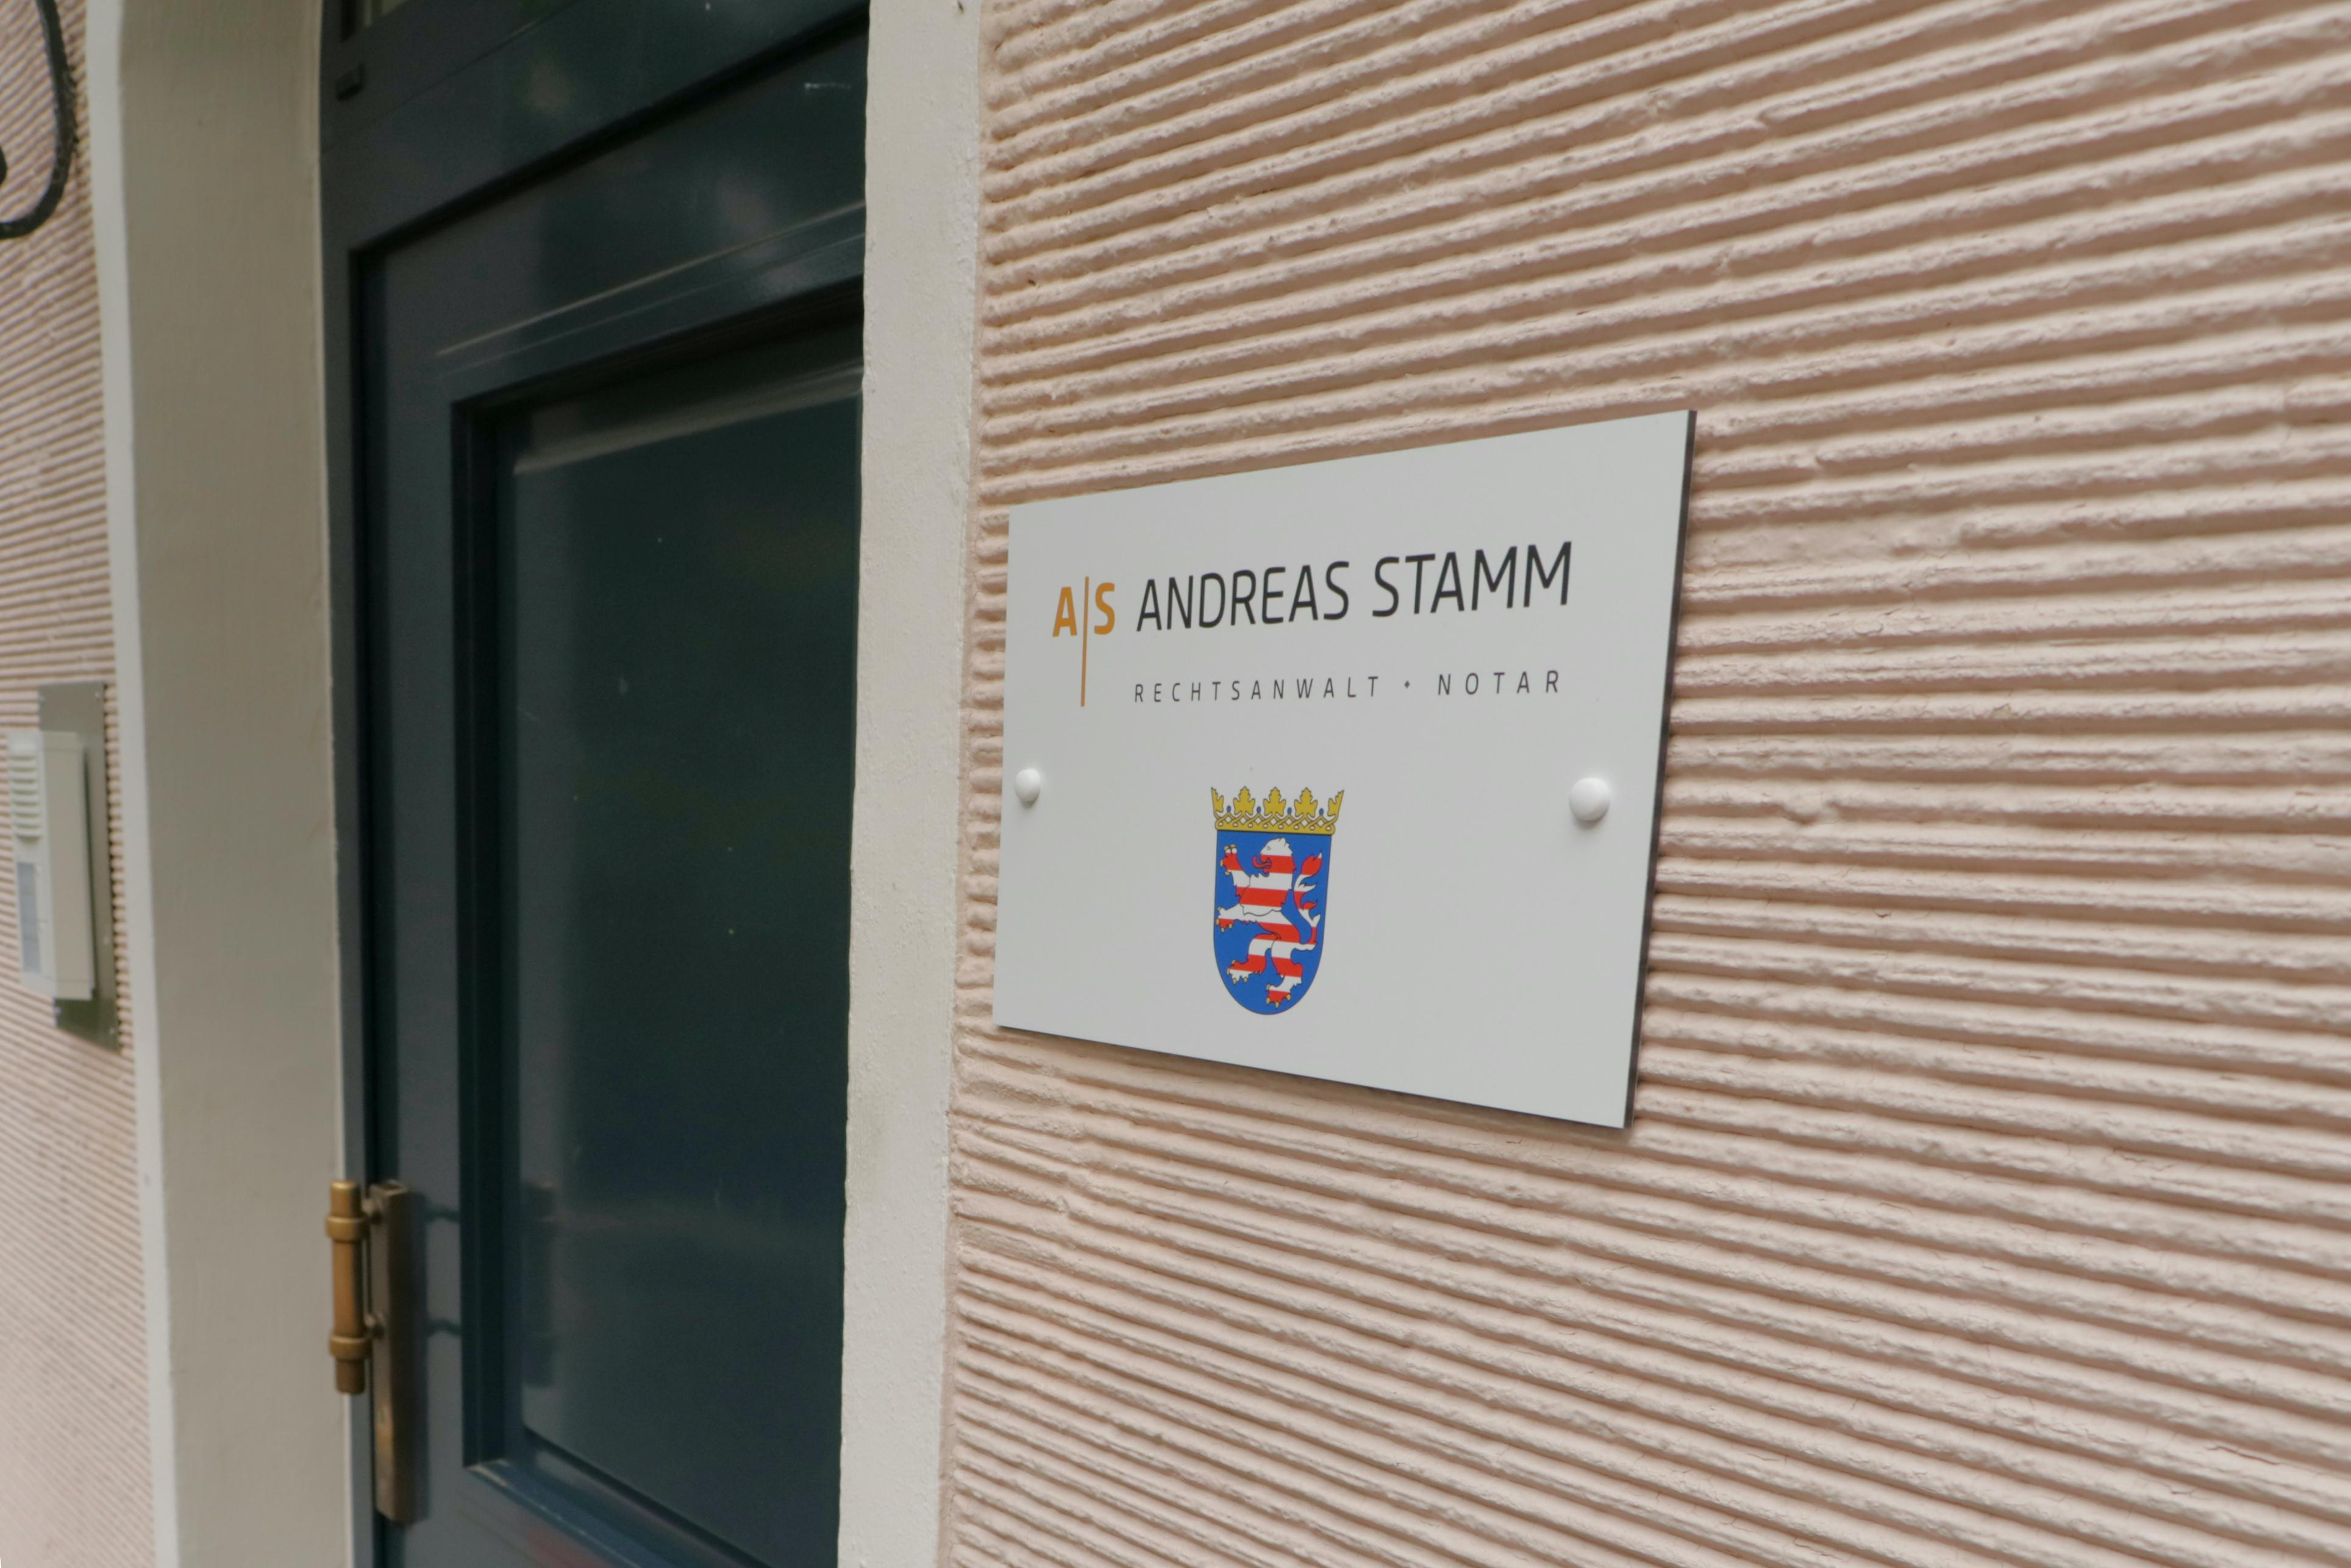 Andreas Stamm – Rechtsanwalt & Notar Wiesbaden